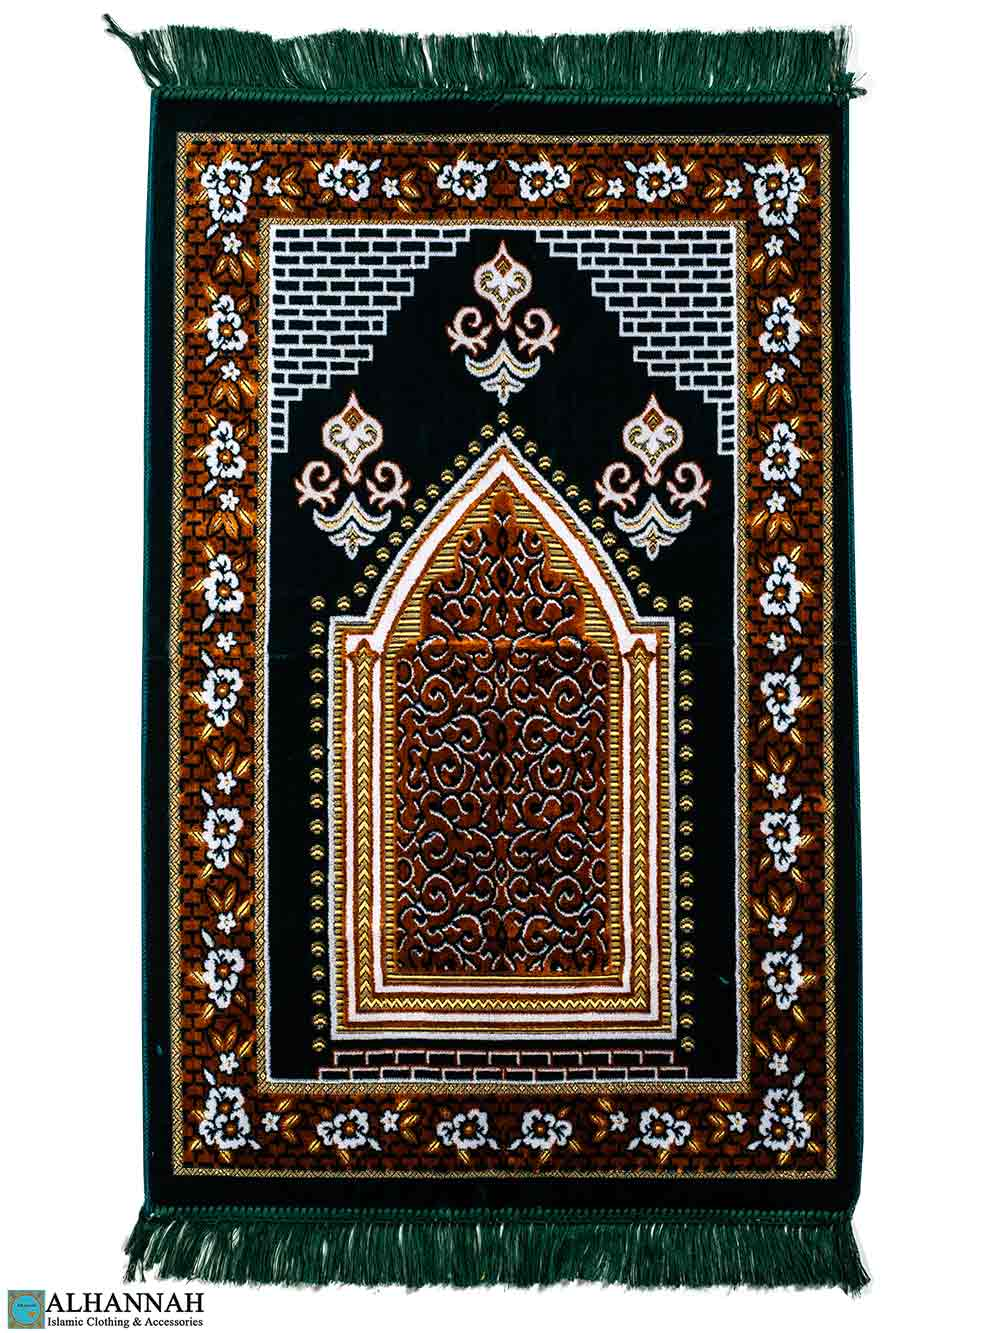 Turkish Prayer Rug Floral Border in Green